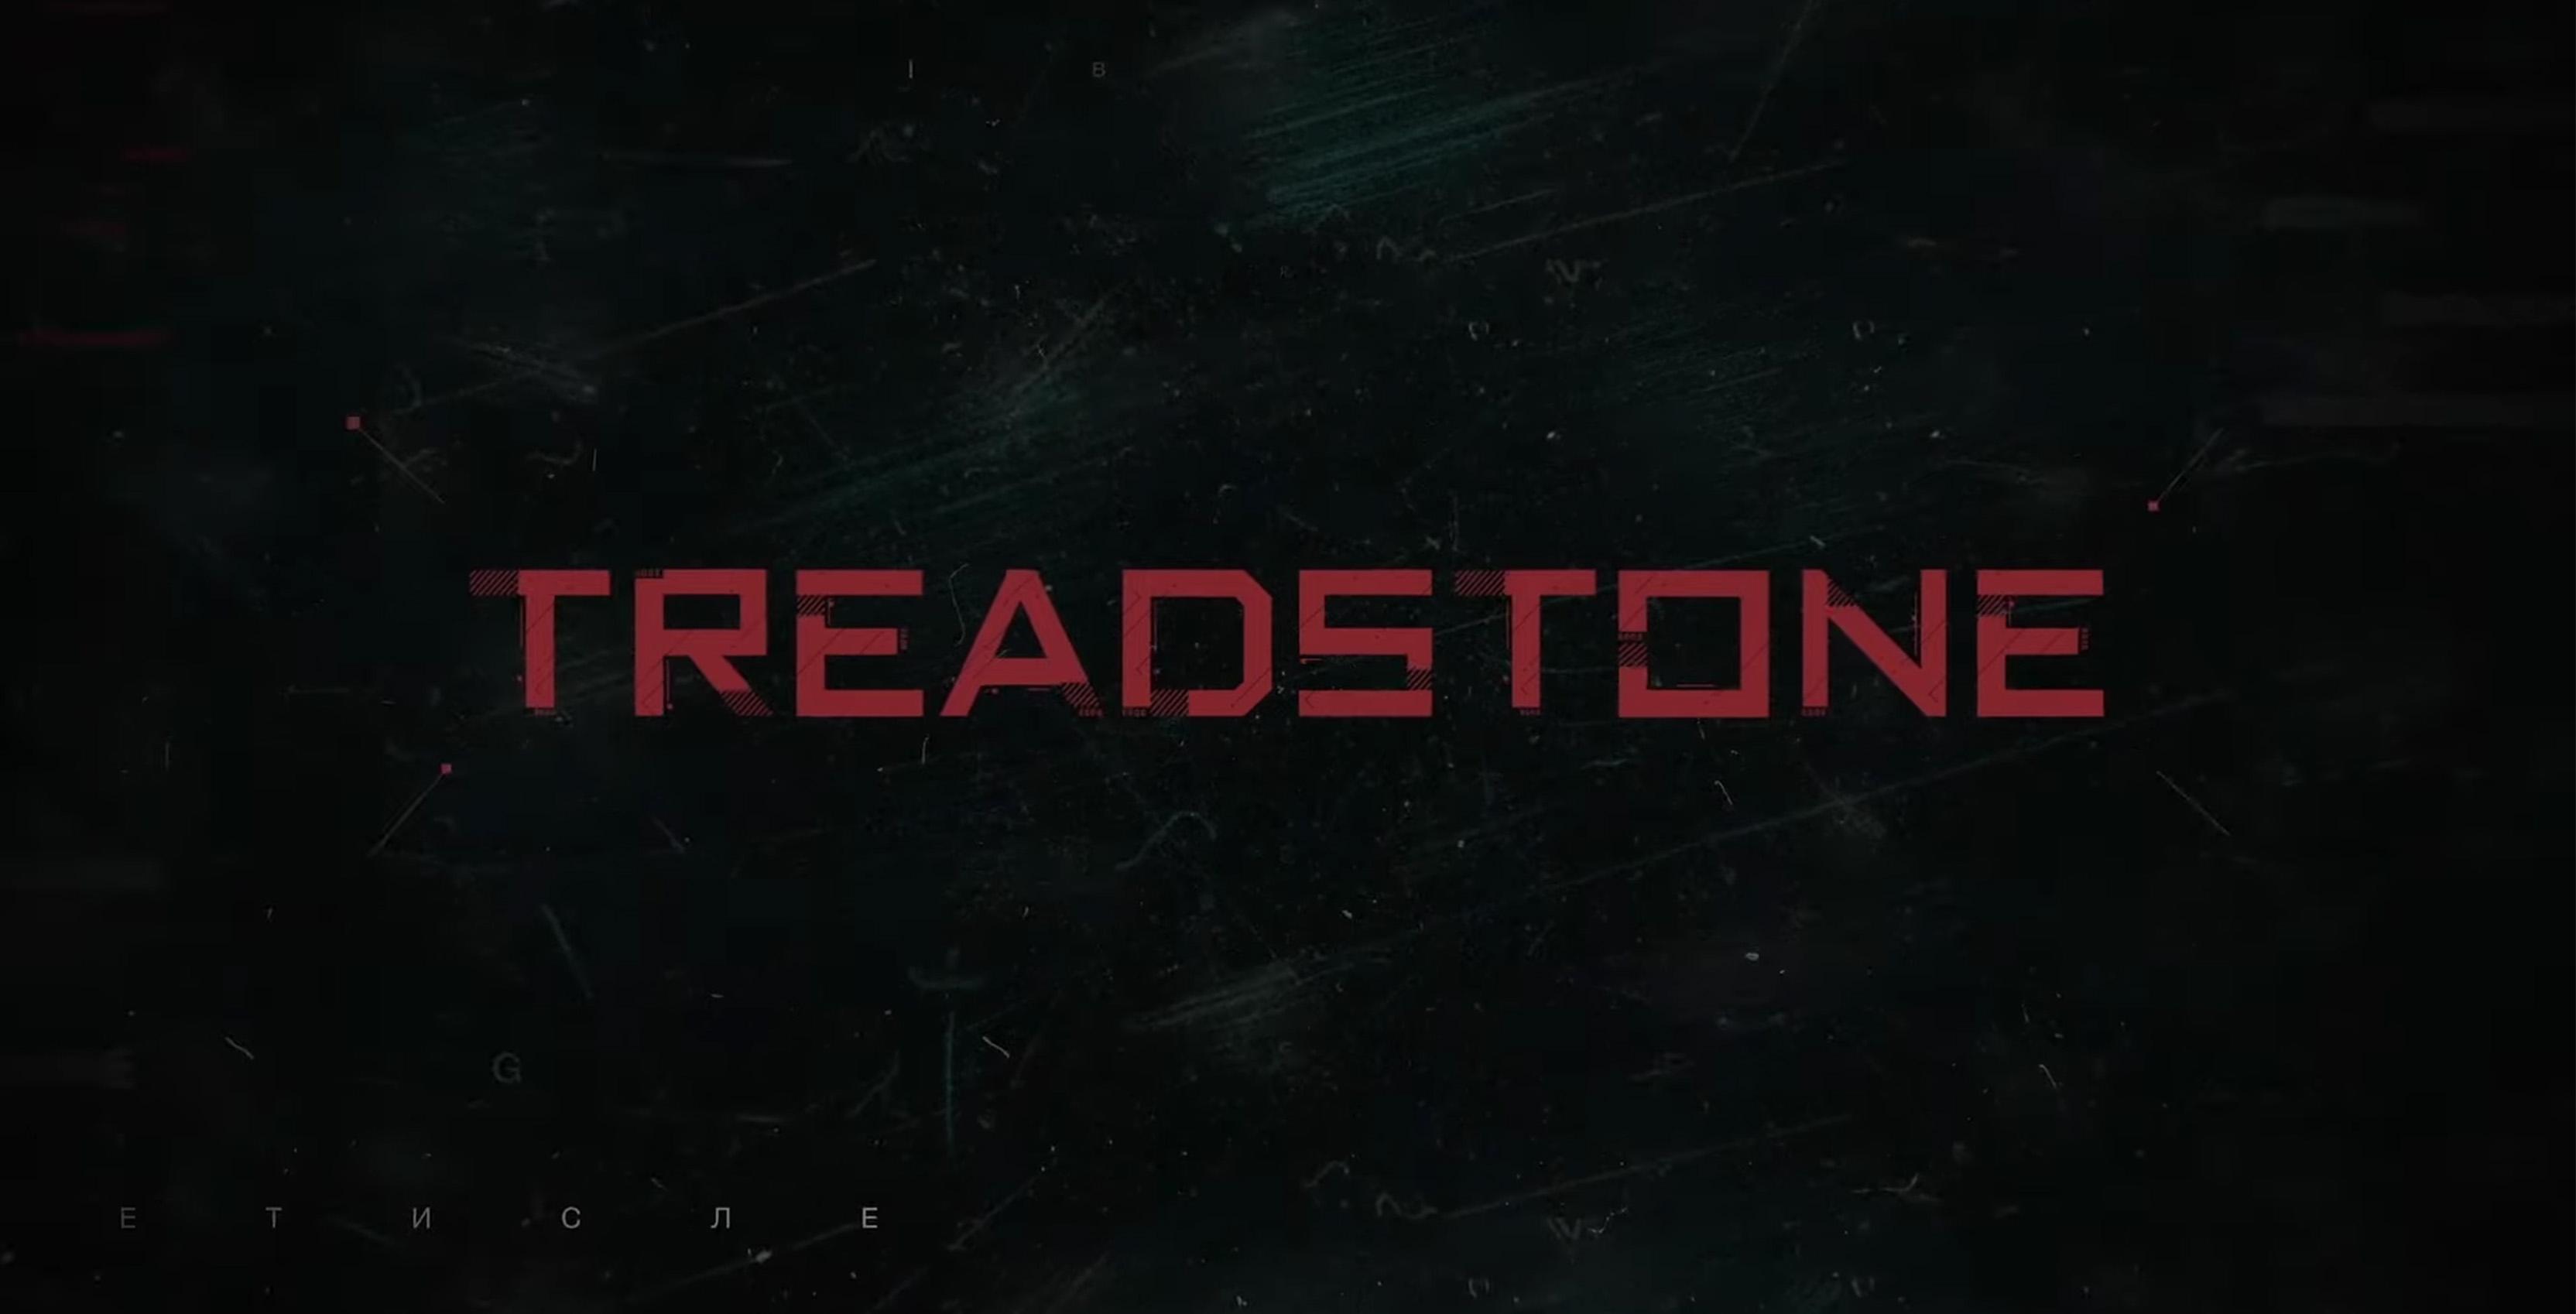 Treadstone Amazon Prime Video